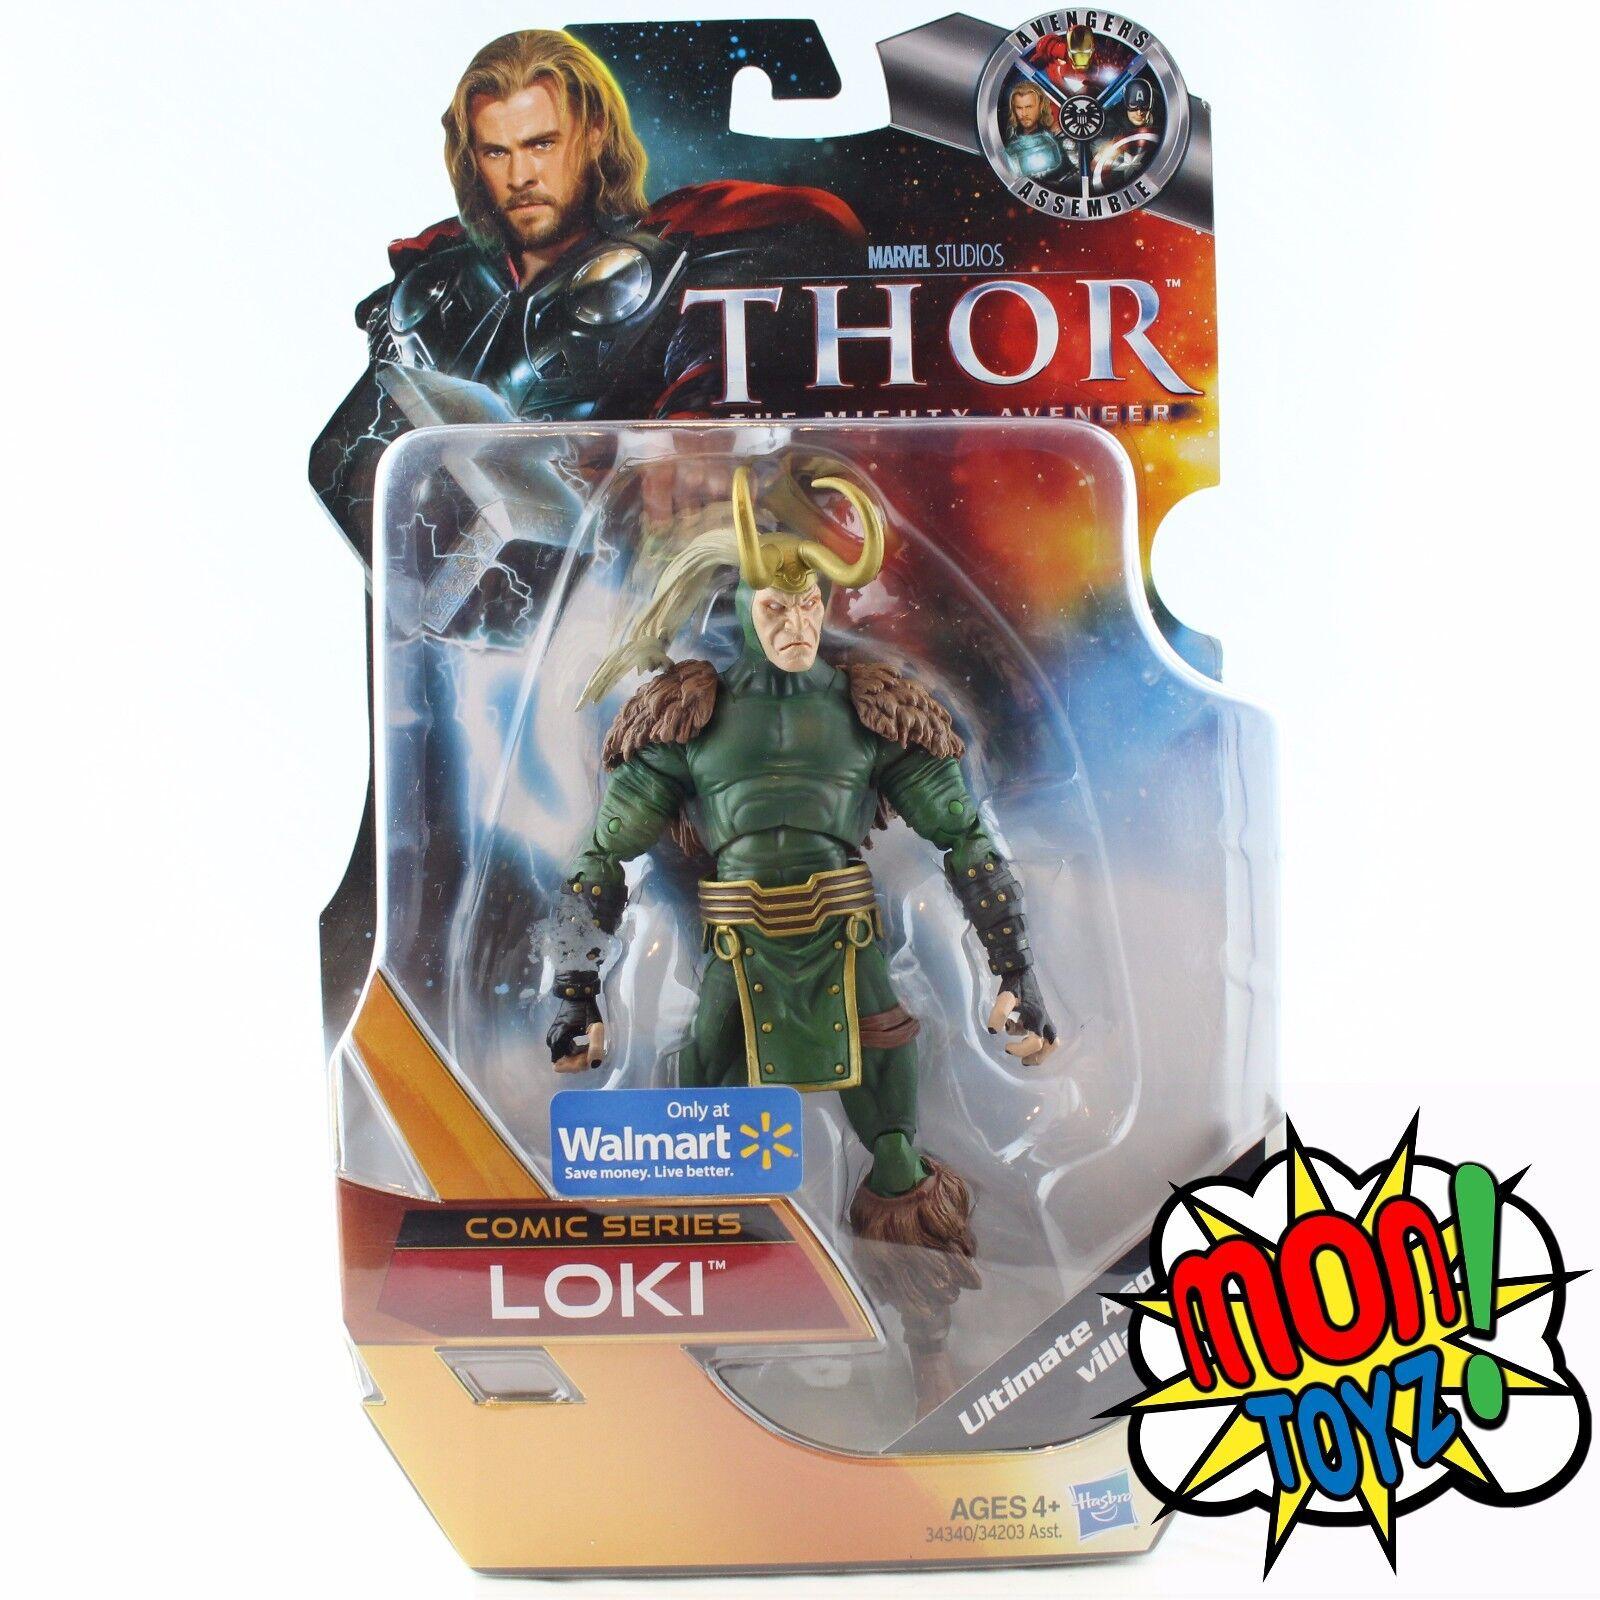 Loki - Thor Mighty Avengers Comic Series